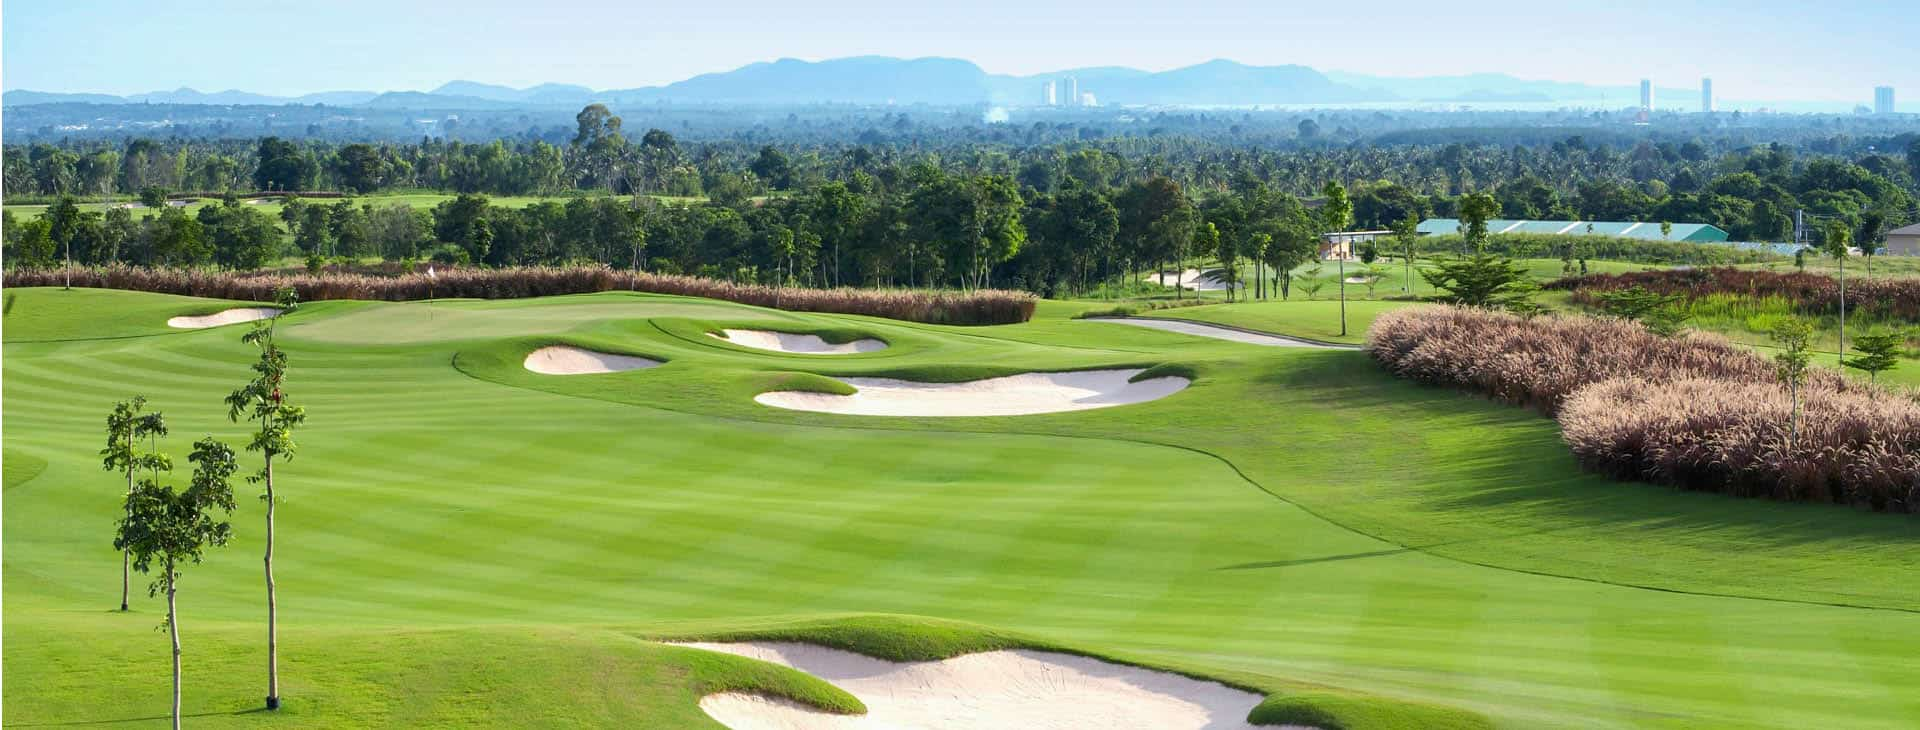 about-us-golf-slider5